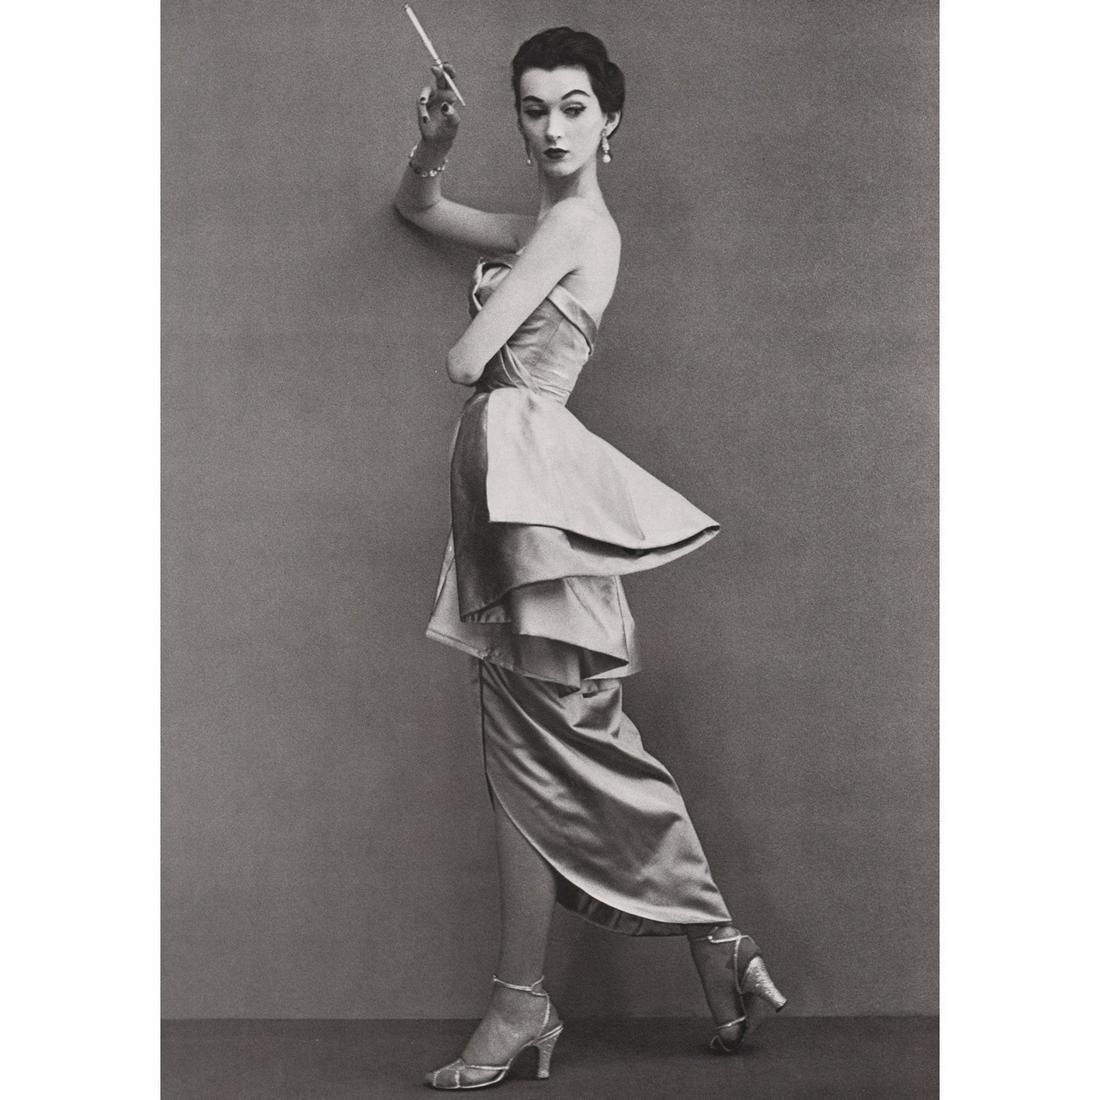 RICHARD AVEDON - Dovima, Dress by Fath, 1950